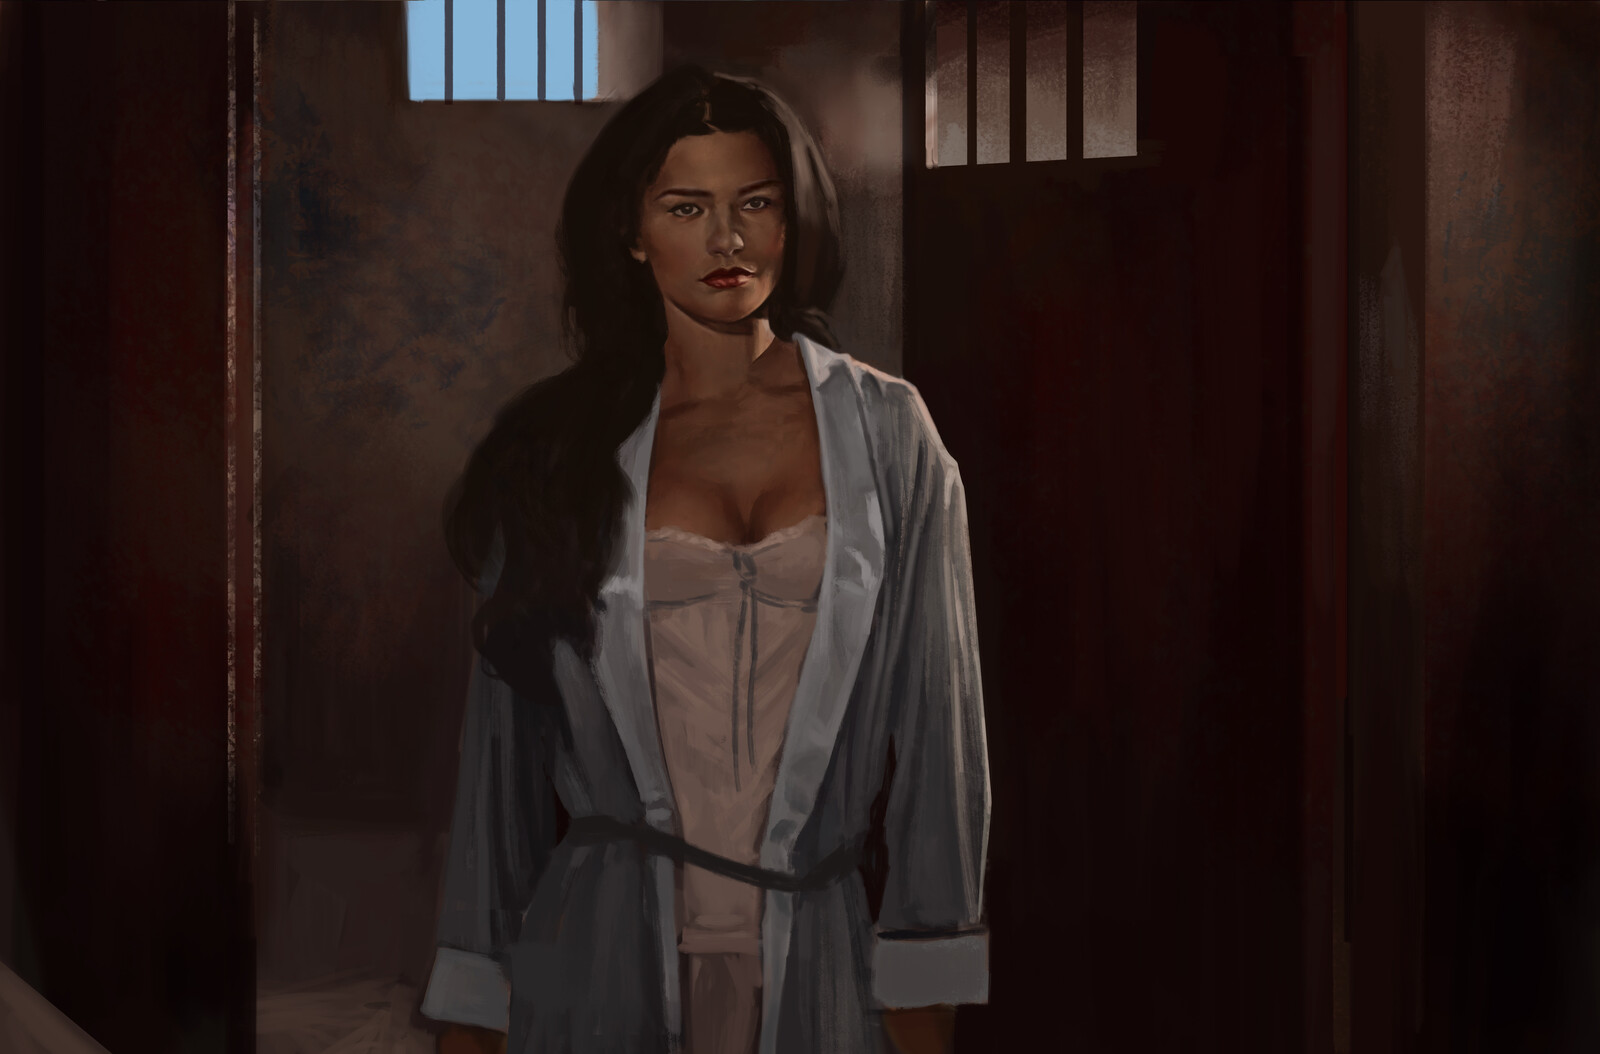 Catherine Zeta Jones study from the 1998 Film The mask of Zorro